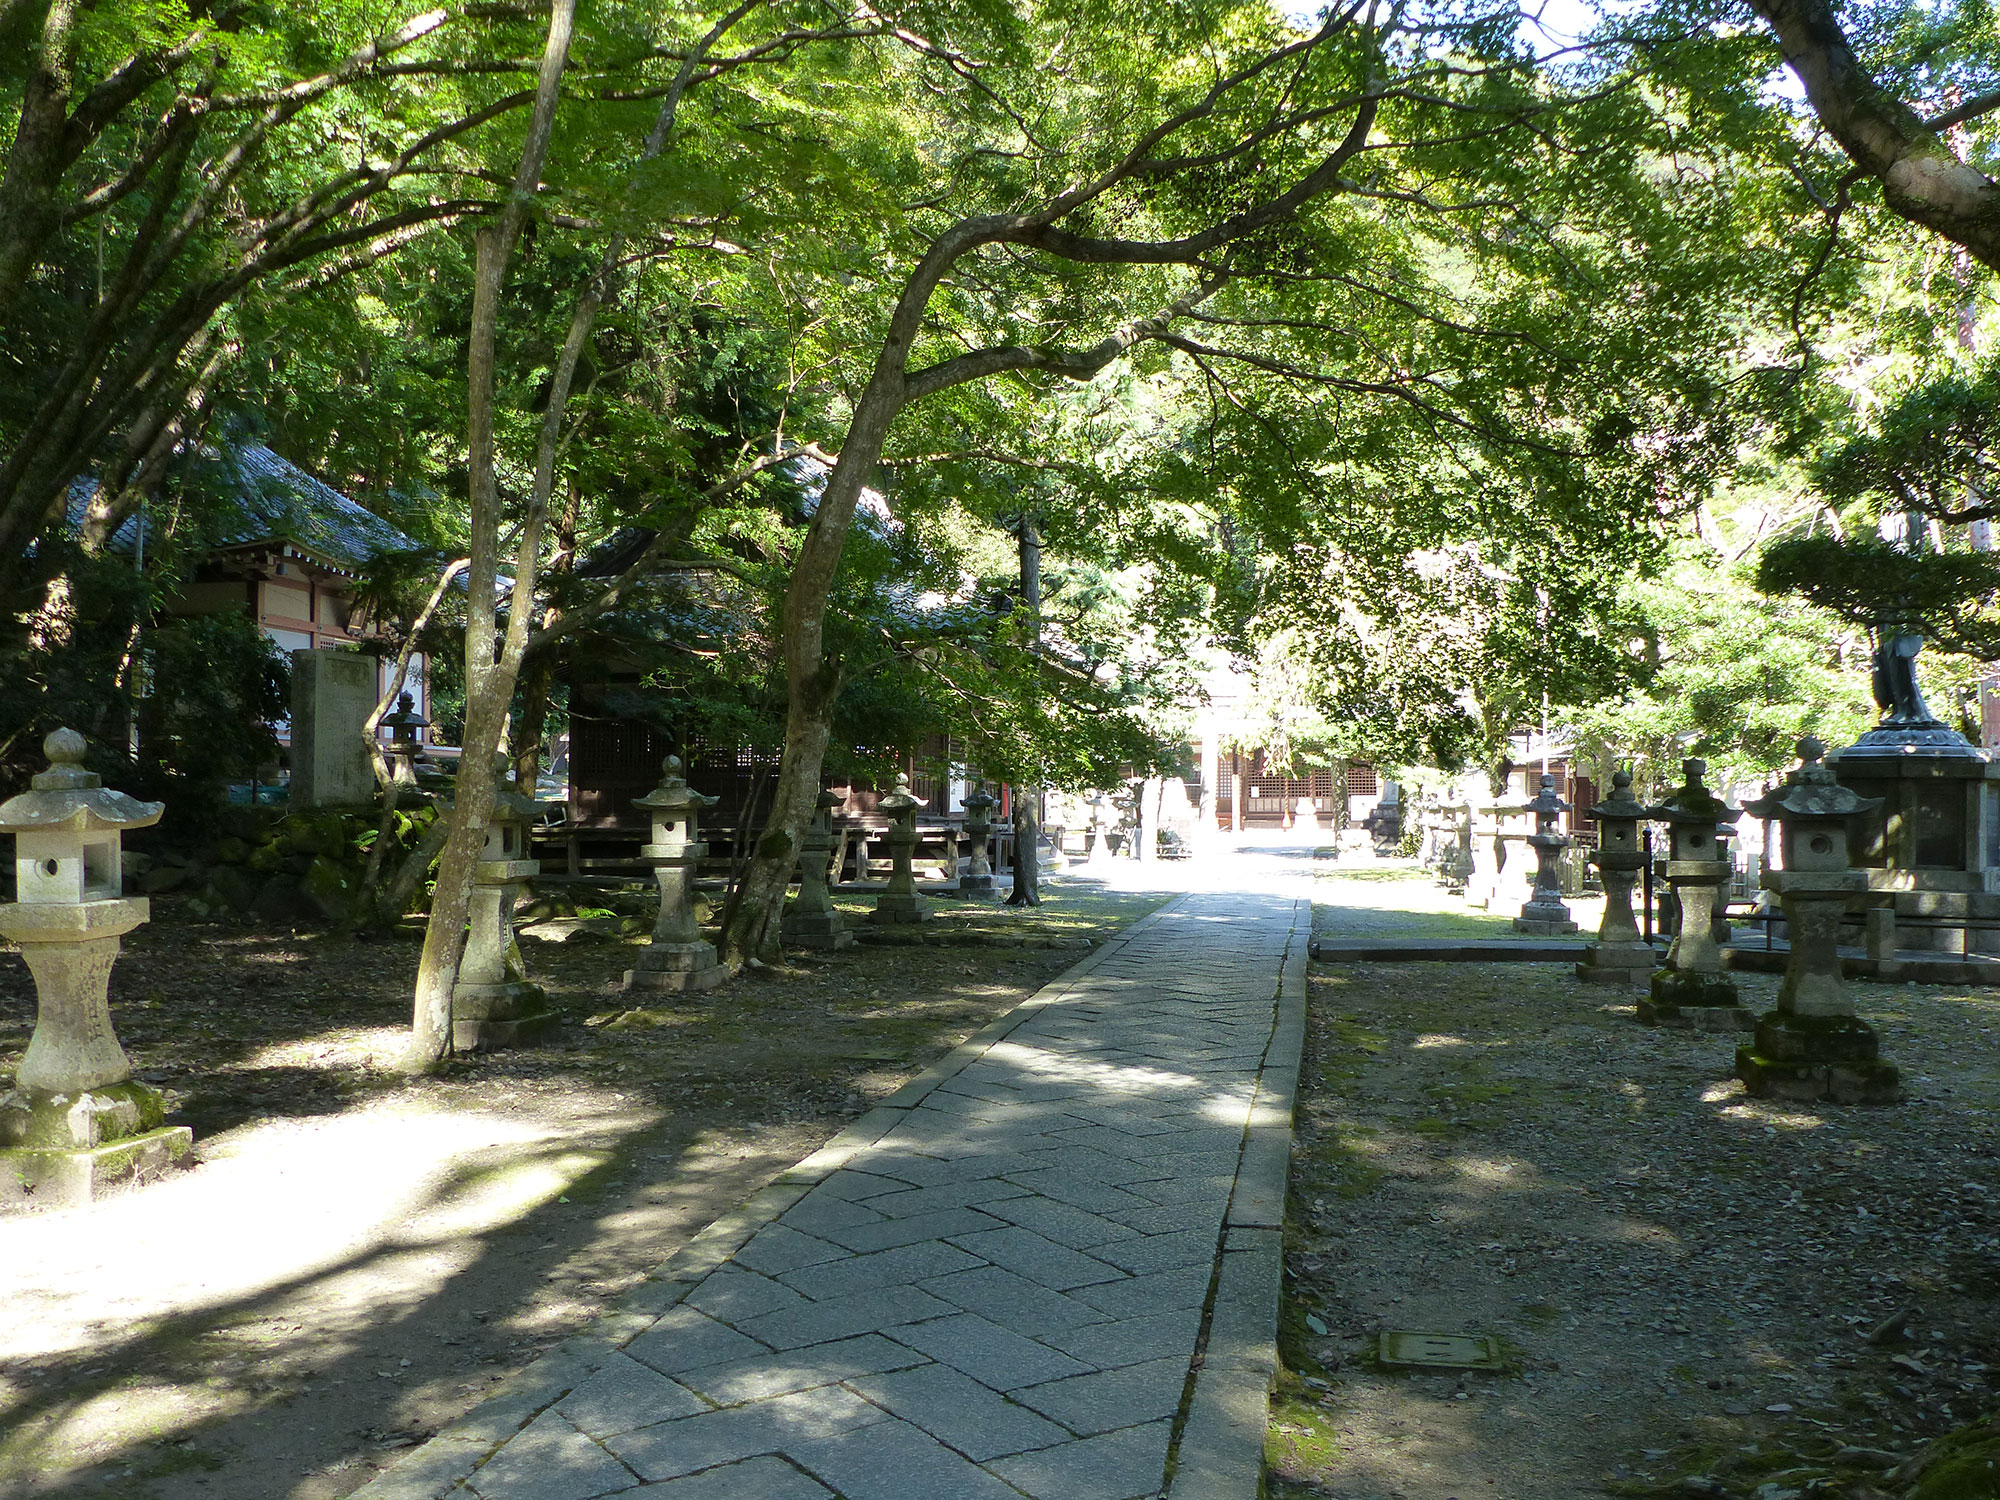 Osaka, Minoh parc - Autour de Marine